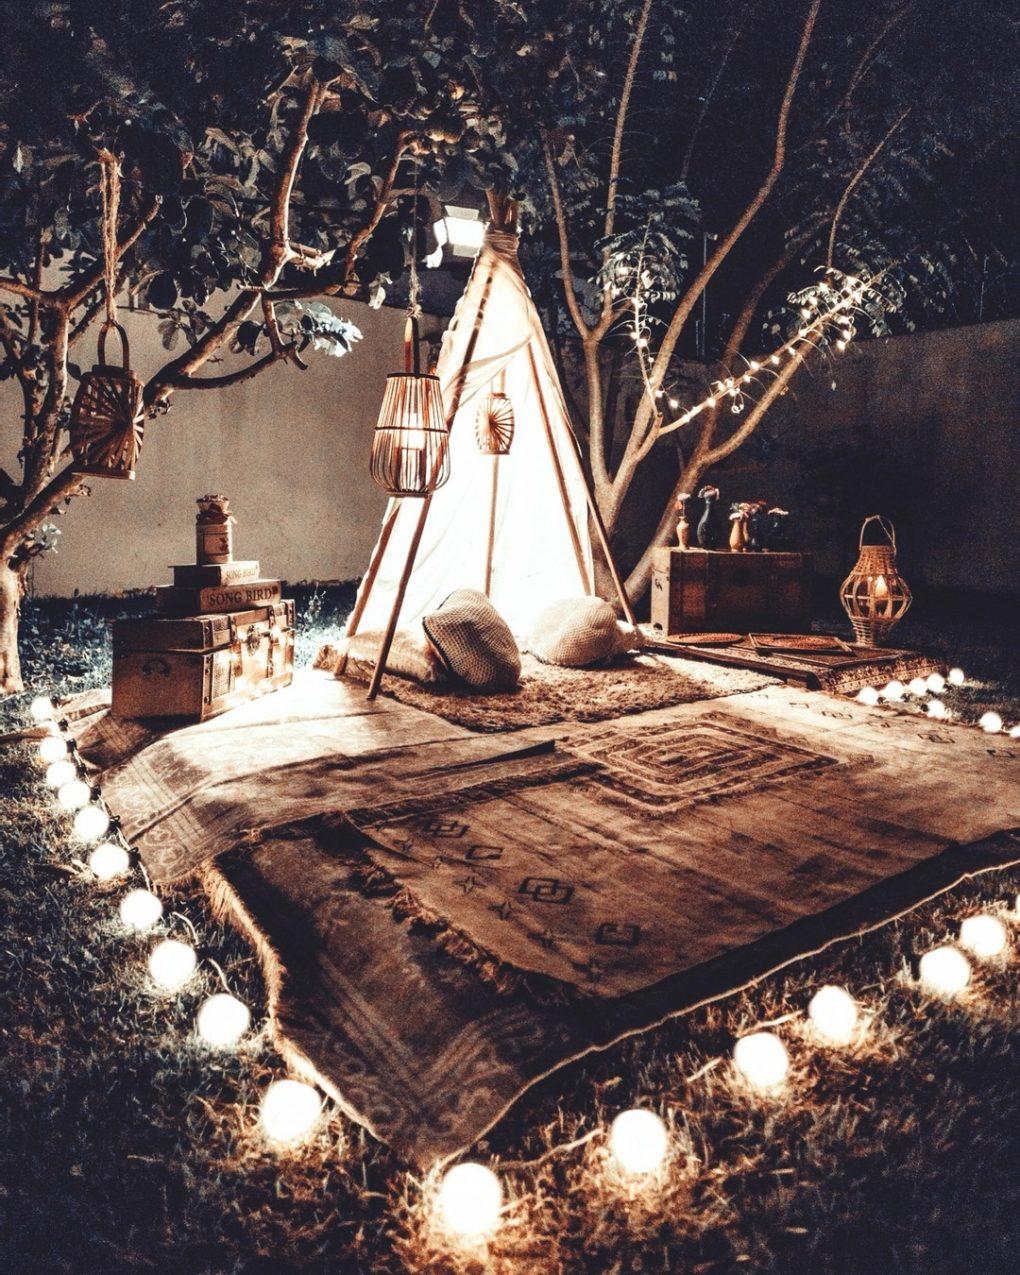 night picnic lights